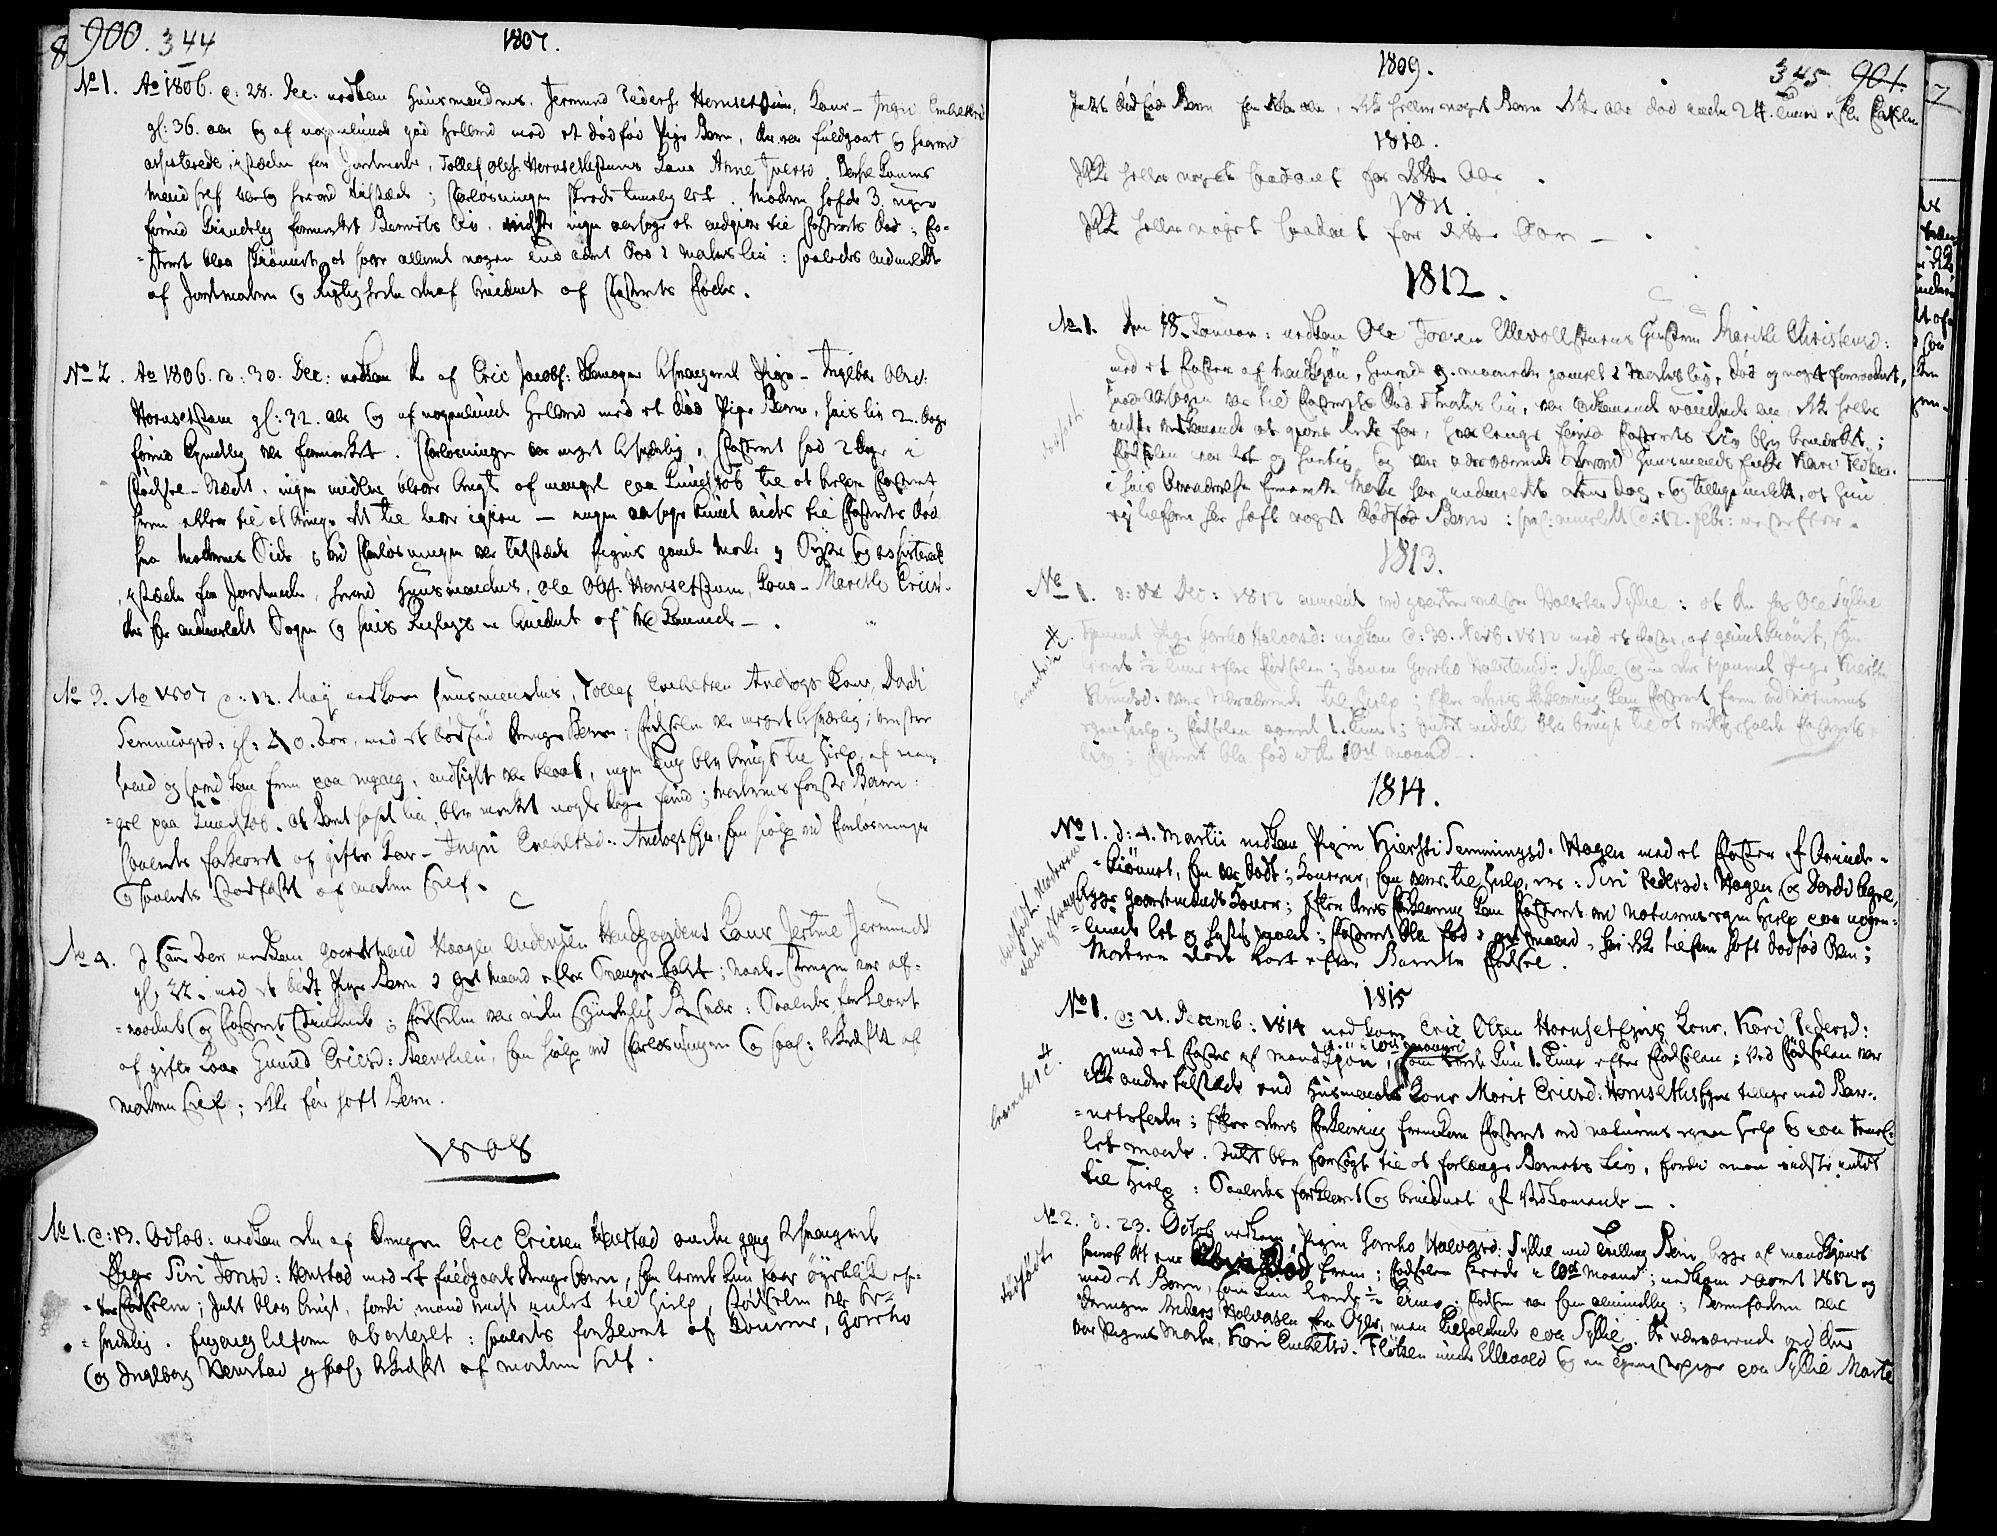 SAH, Rendalen prestekontor, H/Ha/Haa/L0002: Ministerialbok nr. 2, 1788-1814, s. 344-345